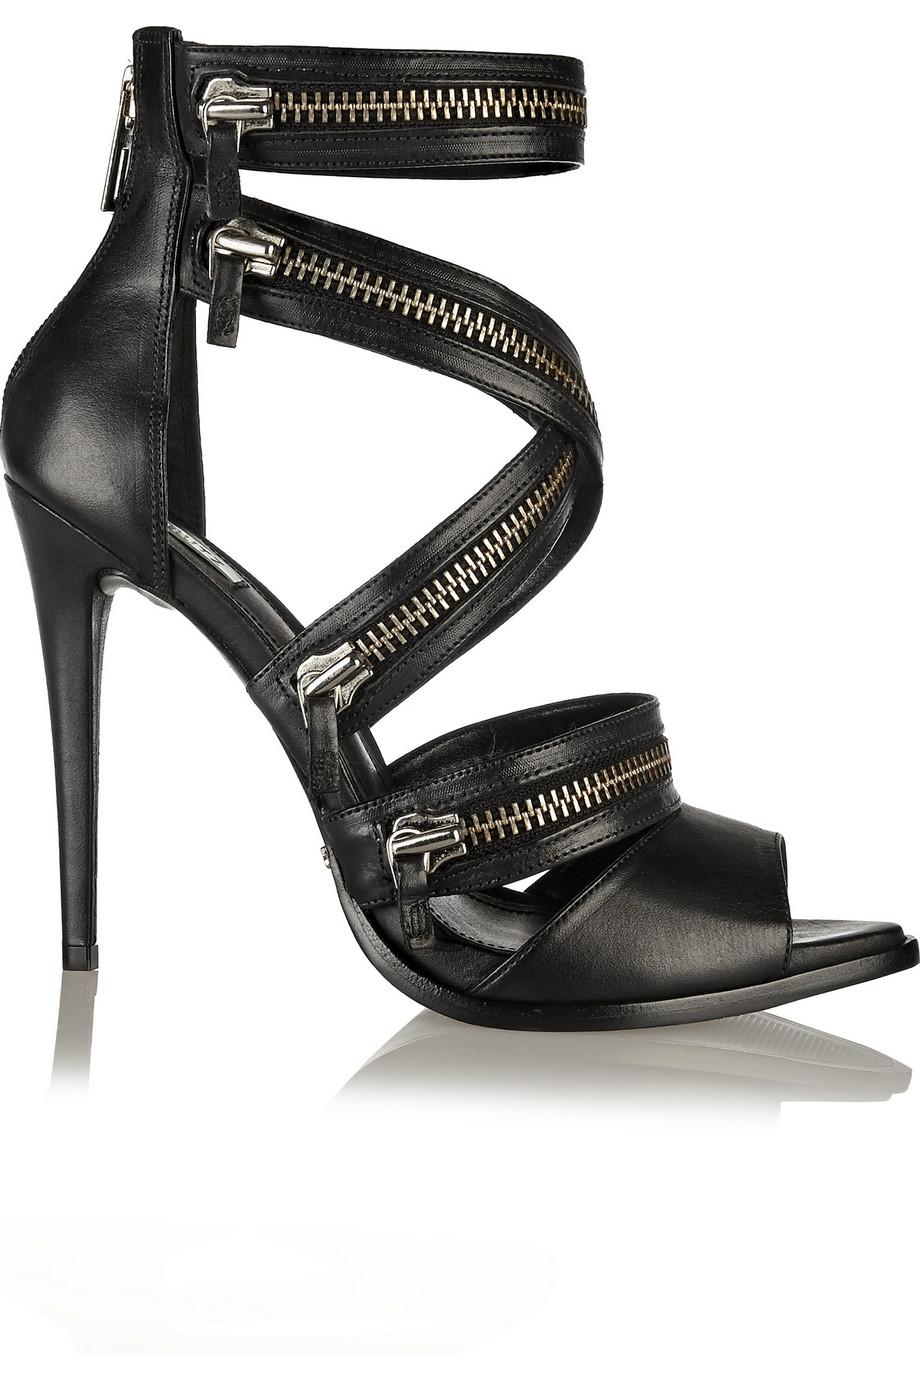 Schutz Nara Zipper Leather Sandals $144